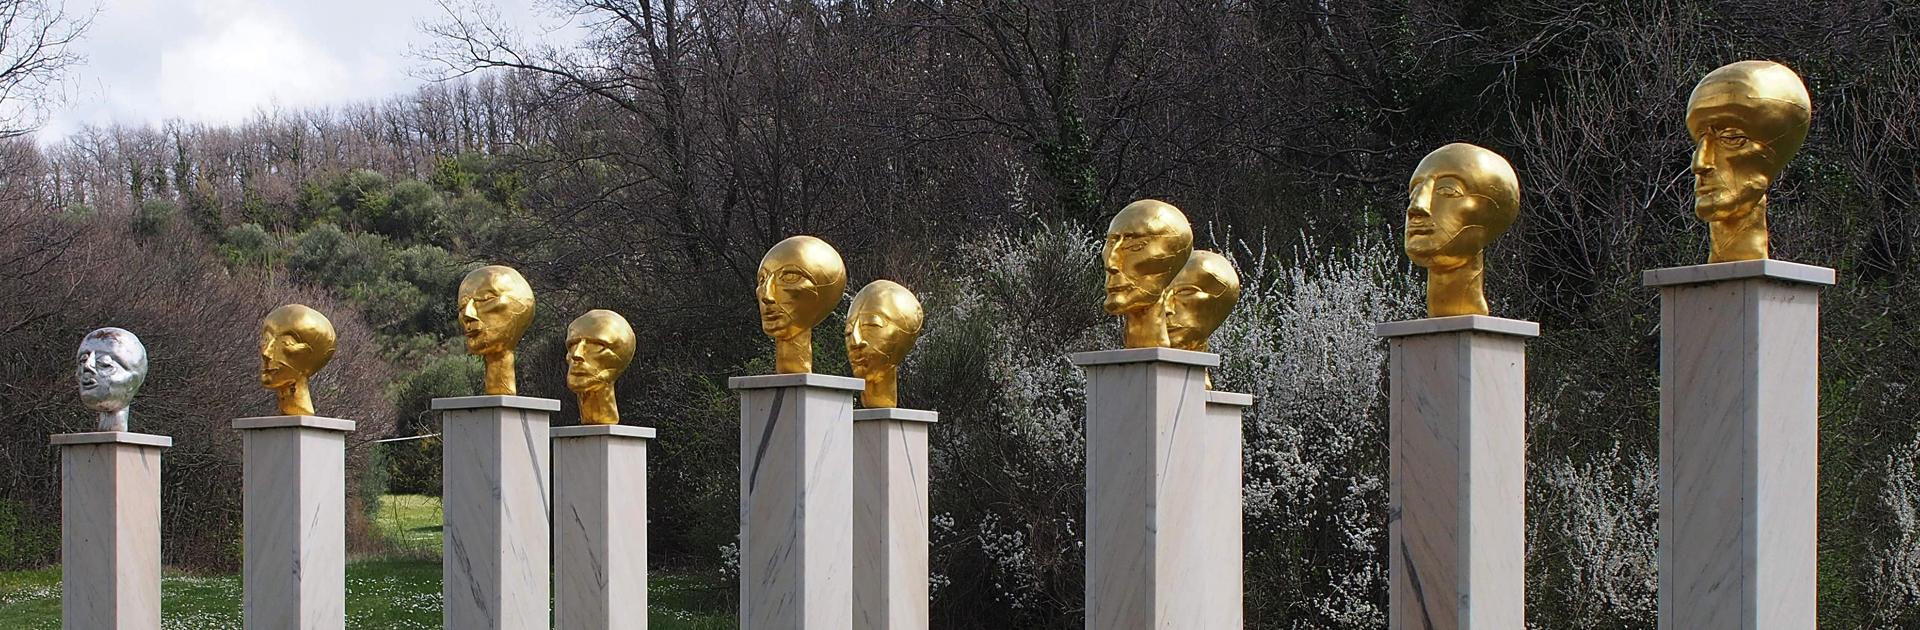 Artist Eva Aeppli Giardino di Daniel Spoerri Italy